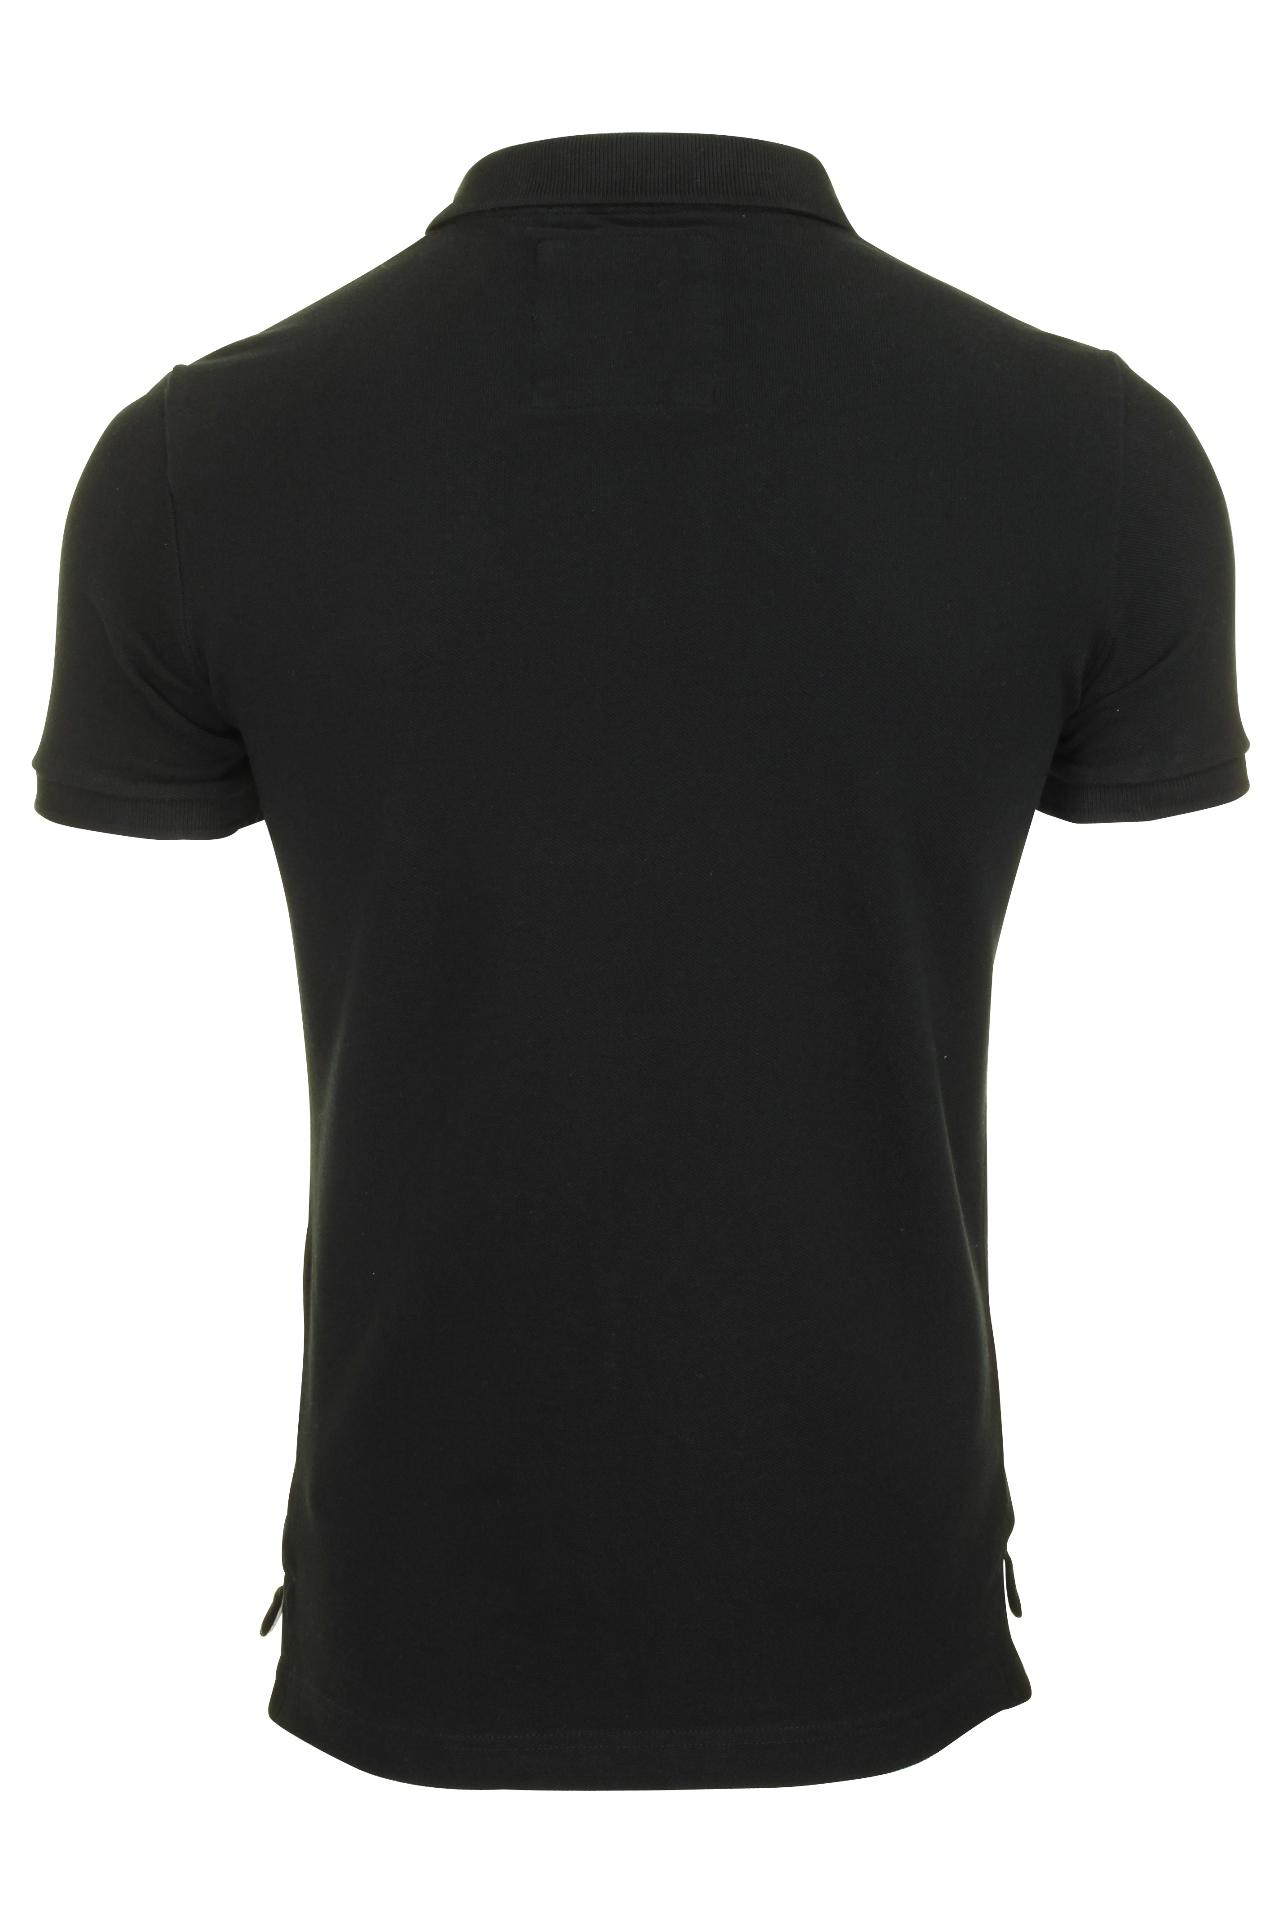 Camisa-clasica-para-hombre-039-Camiseta-Polo-Pique-039 miniatura 5